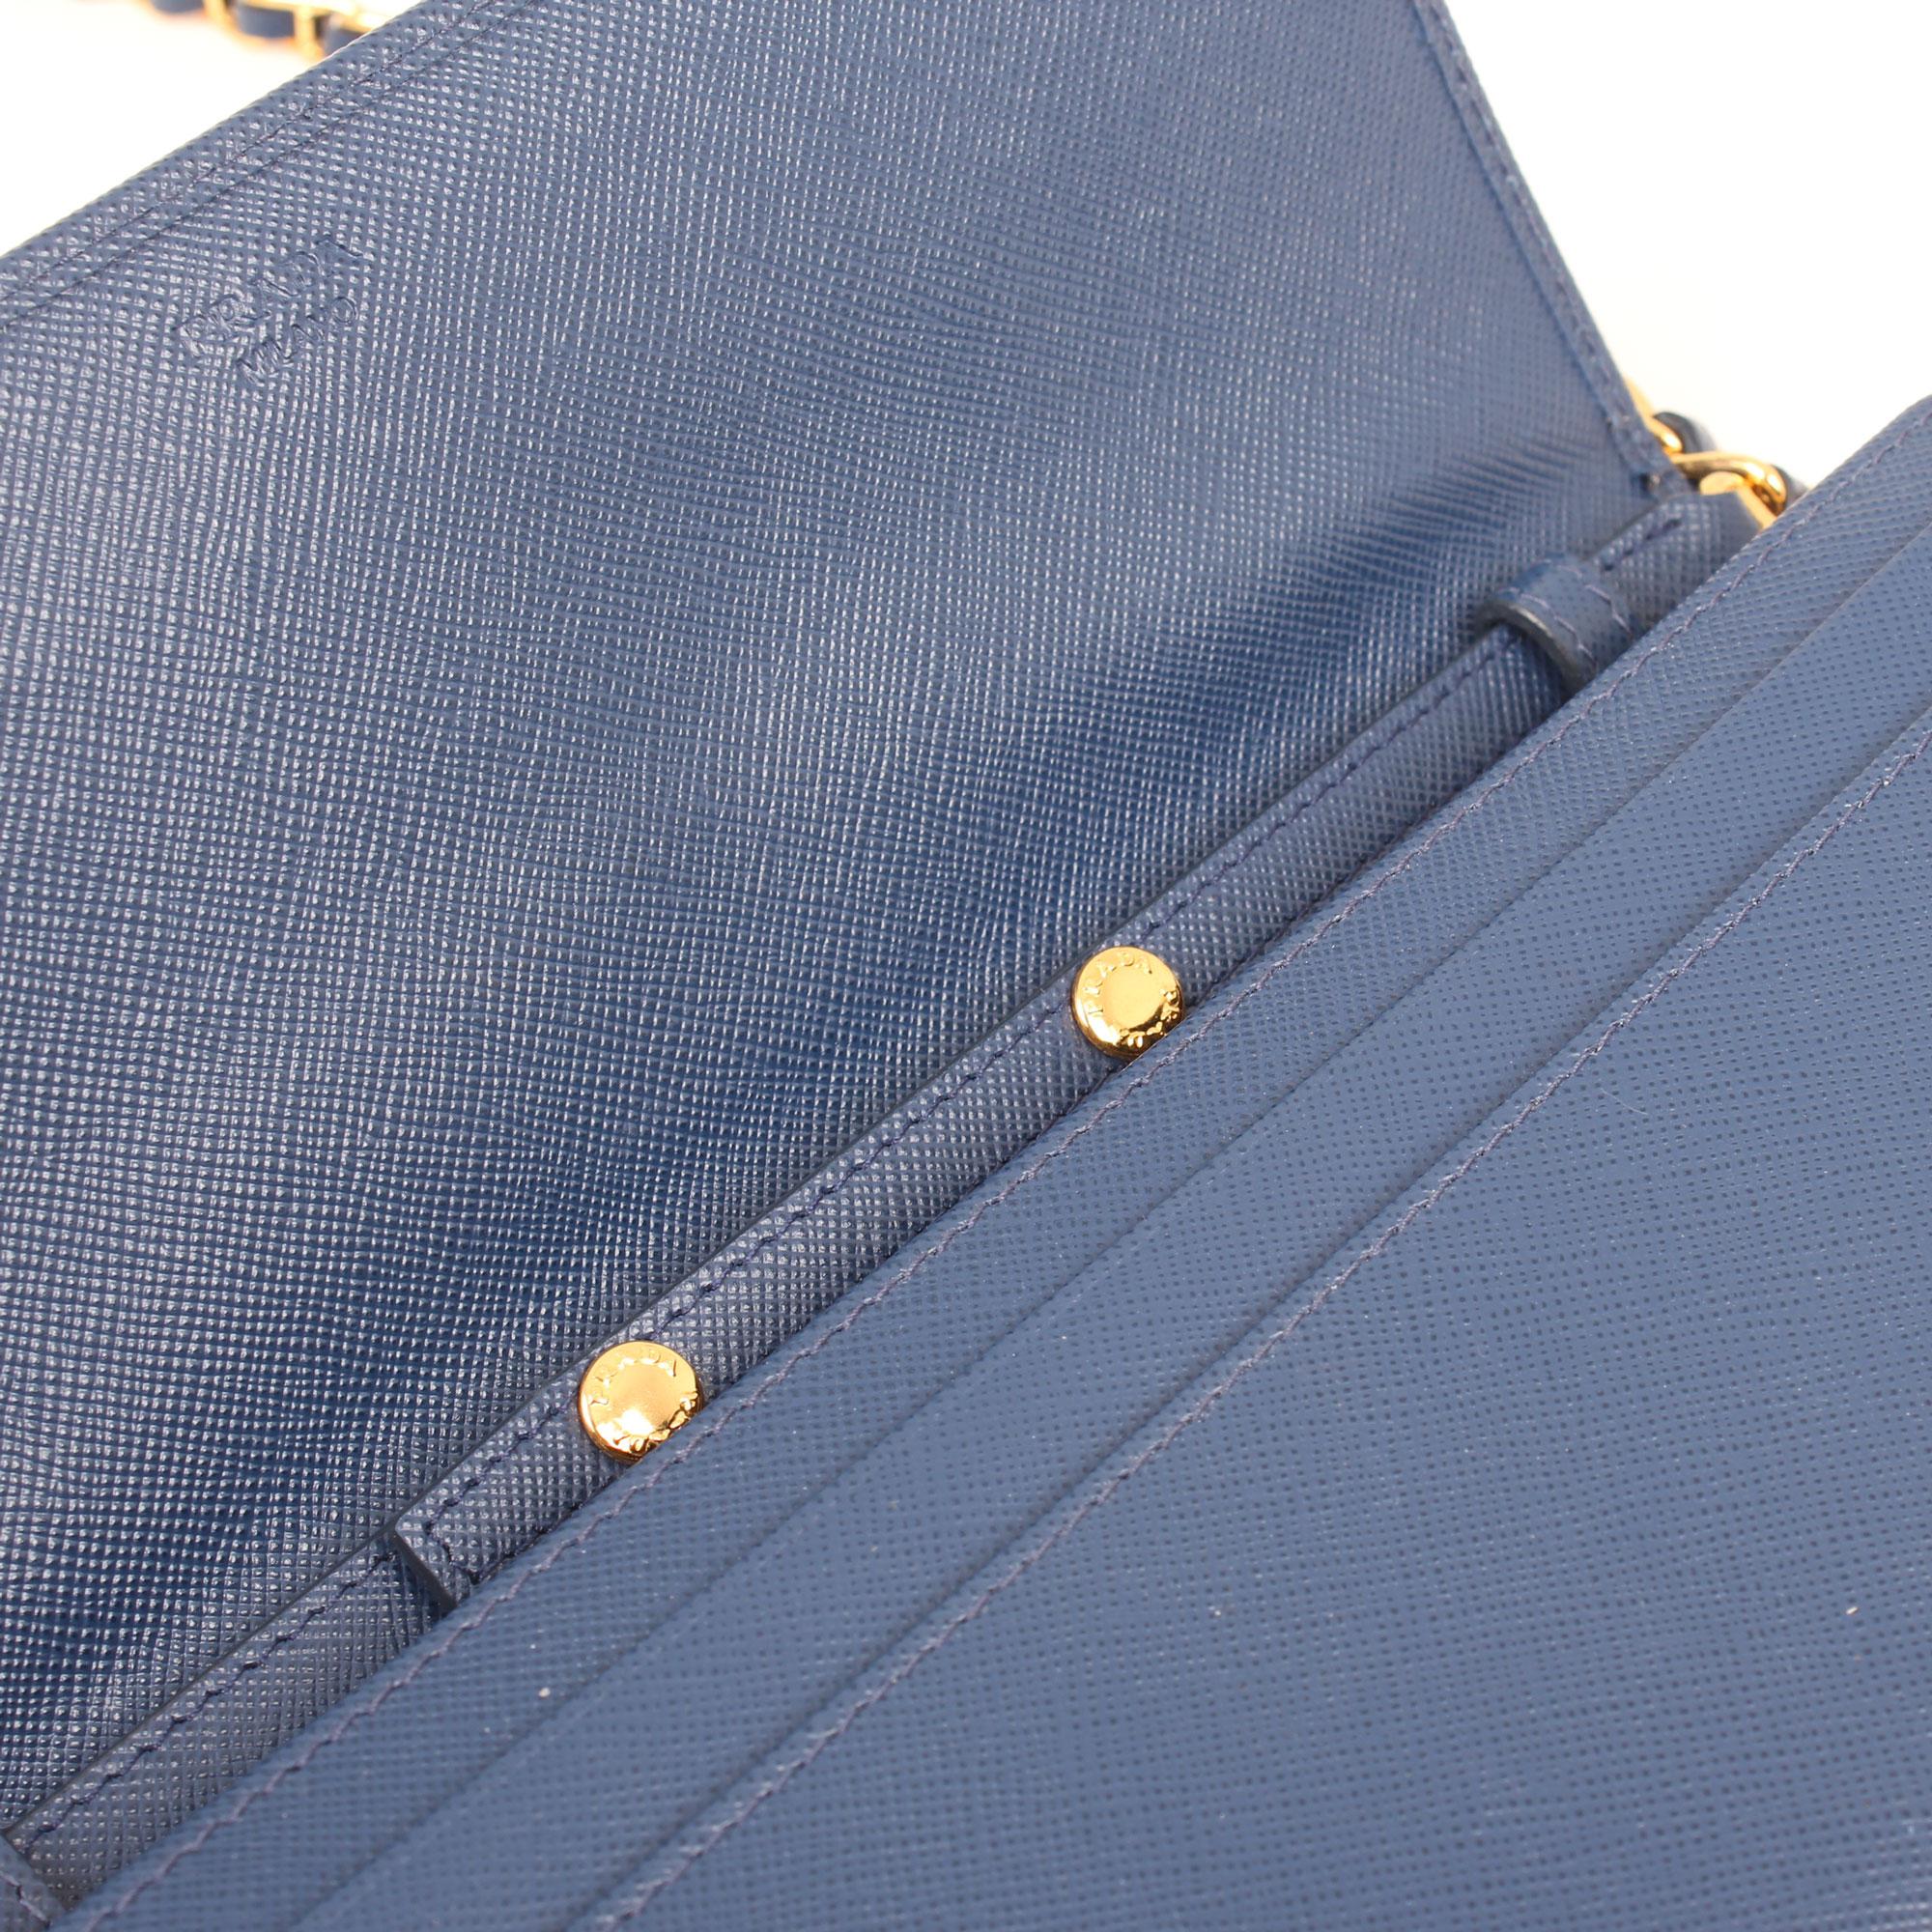 bag-prada-wallet-on-chain-saffiano-metal-bluette-azul-brand